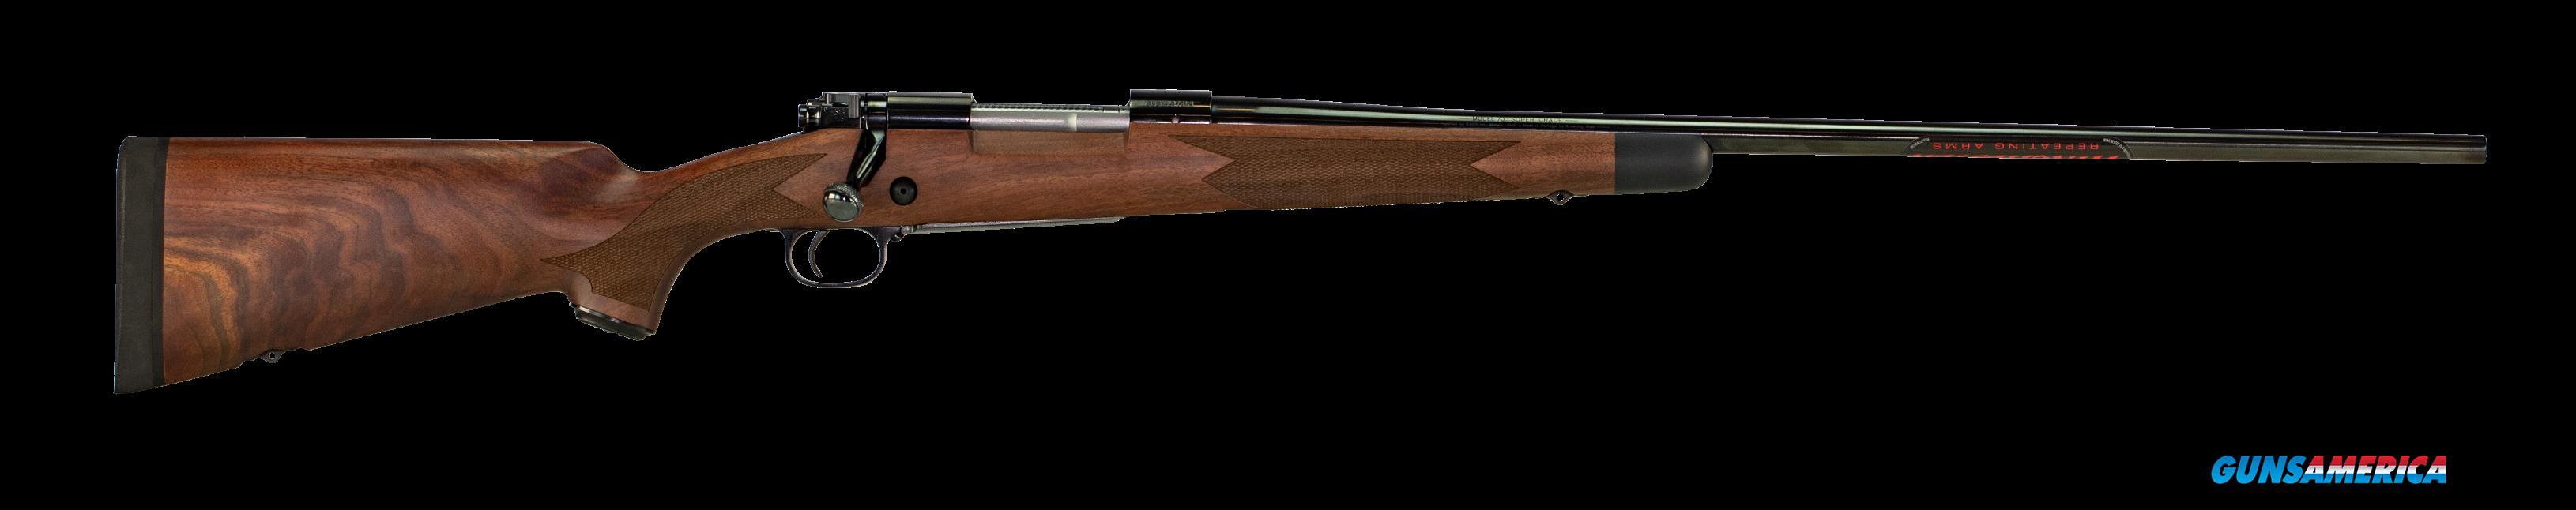 Winchester Guns 70, Wgun 535203229 M70 Super 264 Win  Guns > Pistols > 1911 Pistol Copies (non-Colt)